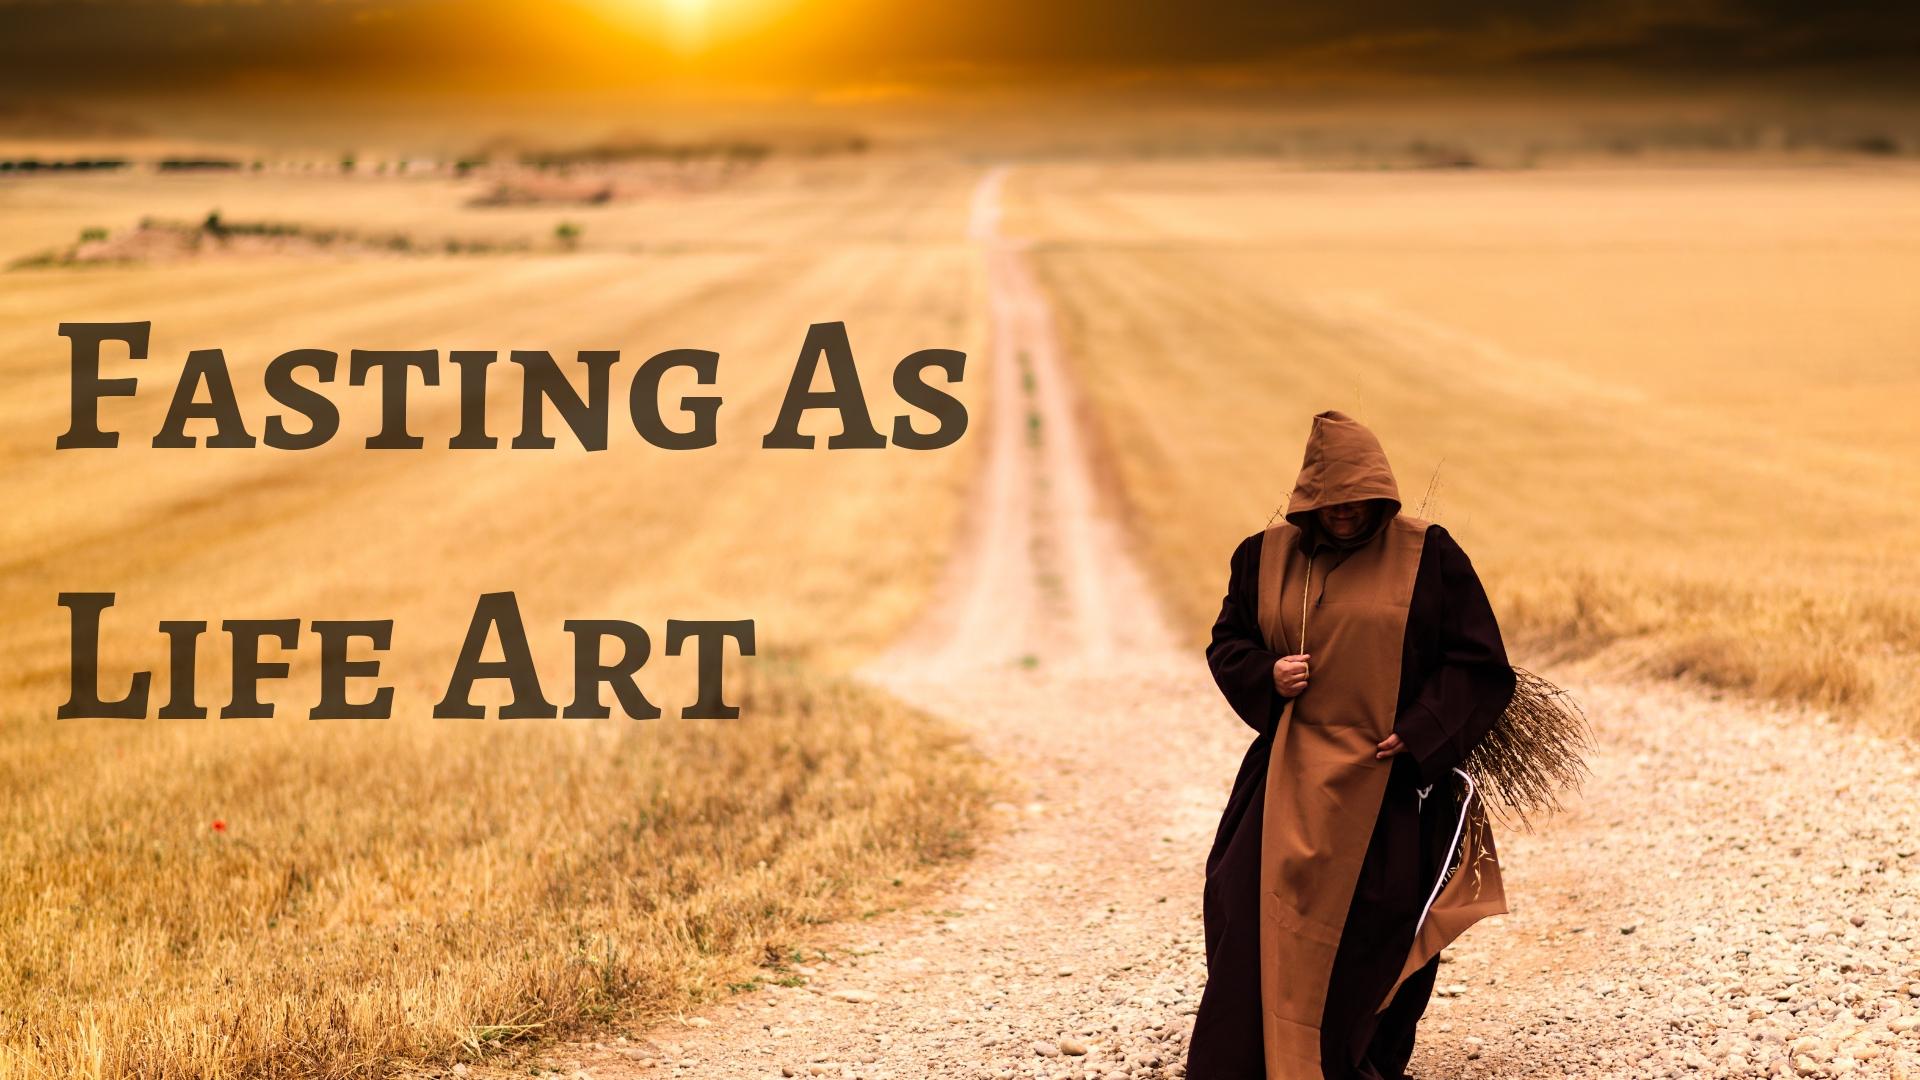 Fasting As Life Art.jpg